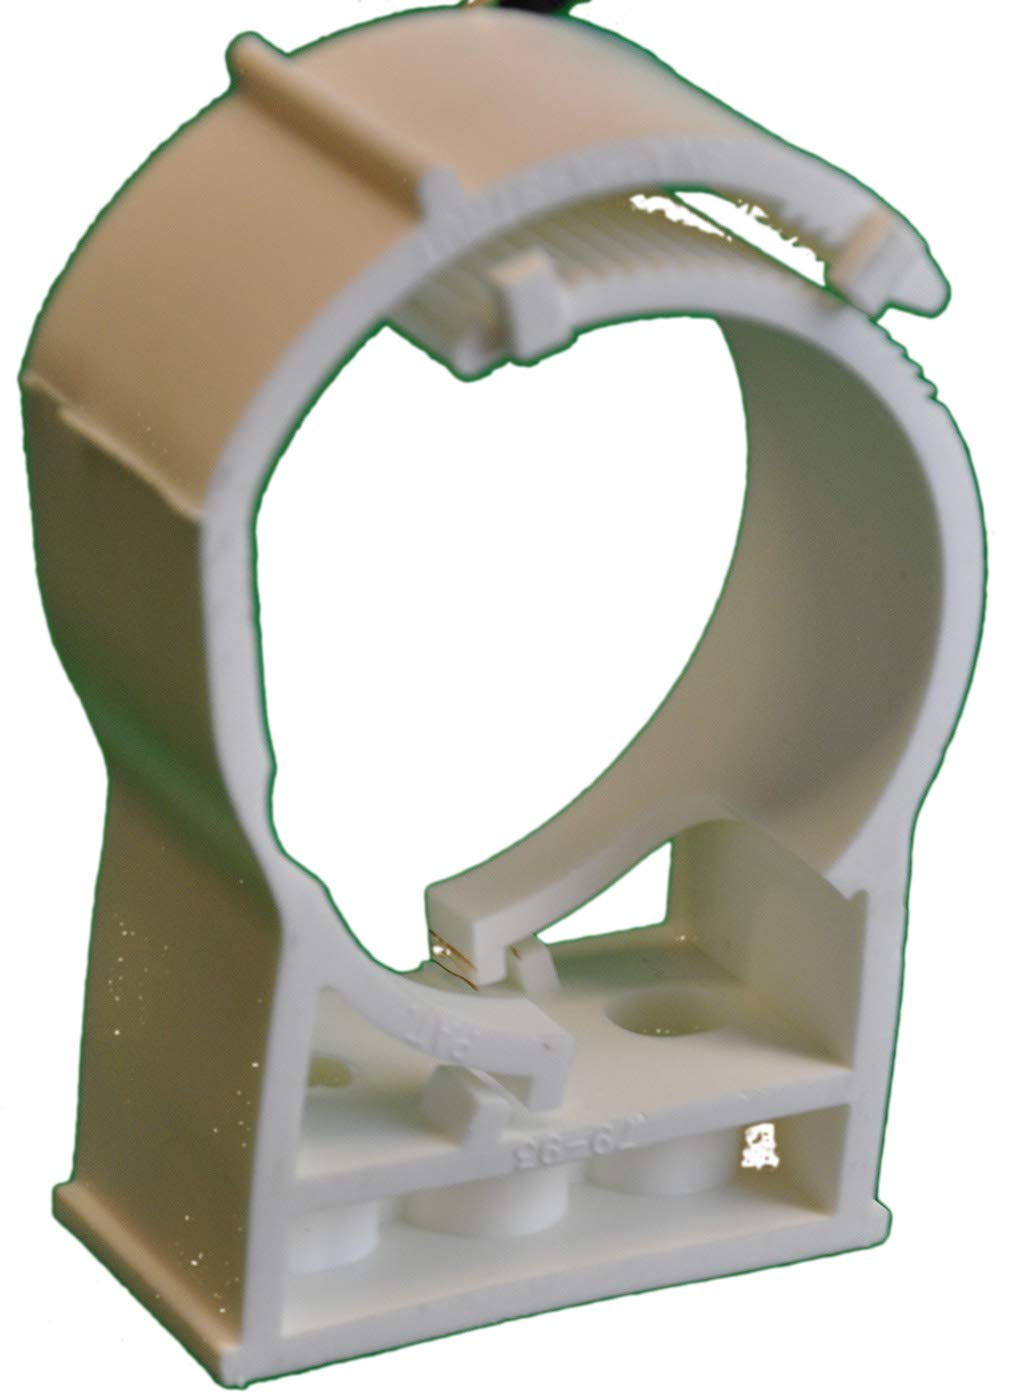 SnapnStrut Qty 10 Snapnstrut HS White PP For 4 Inch PVC Pipe.